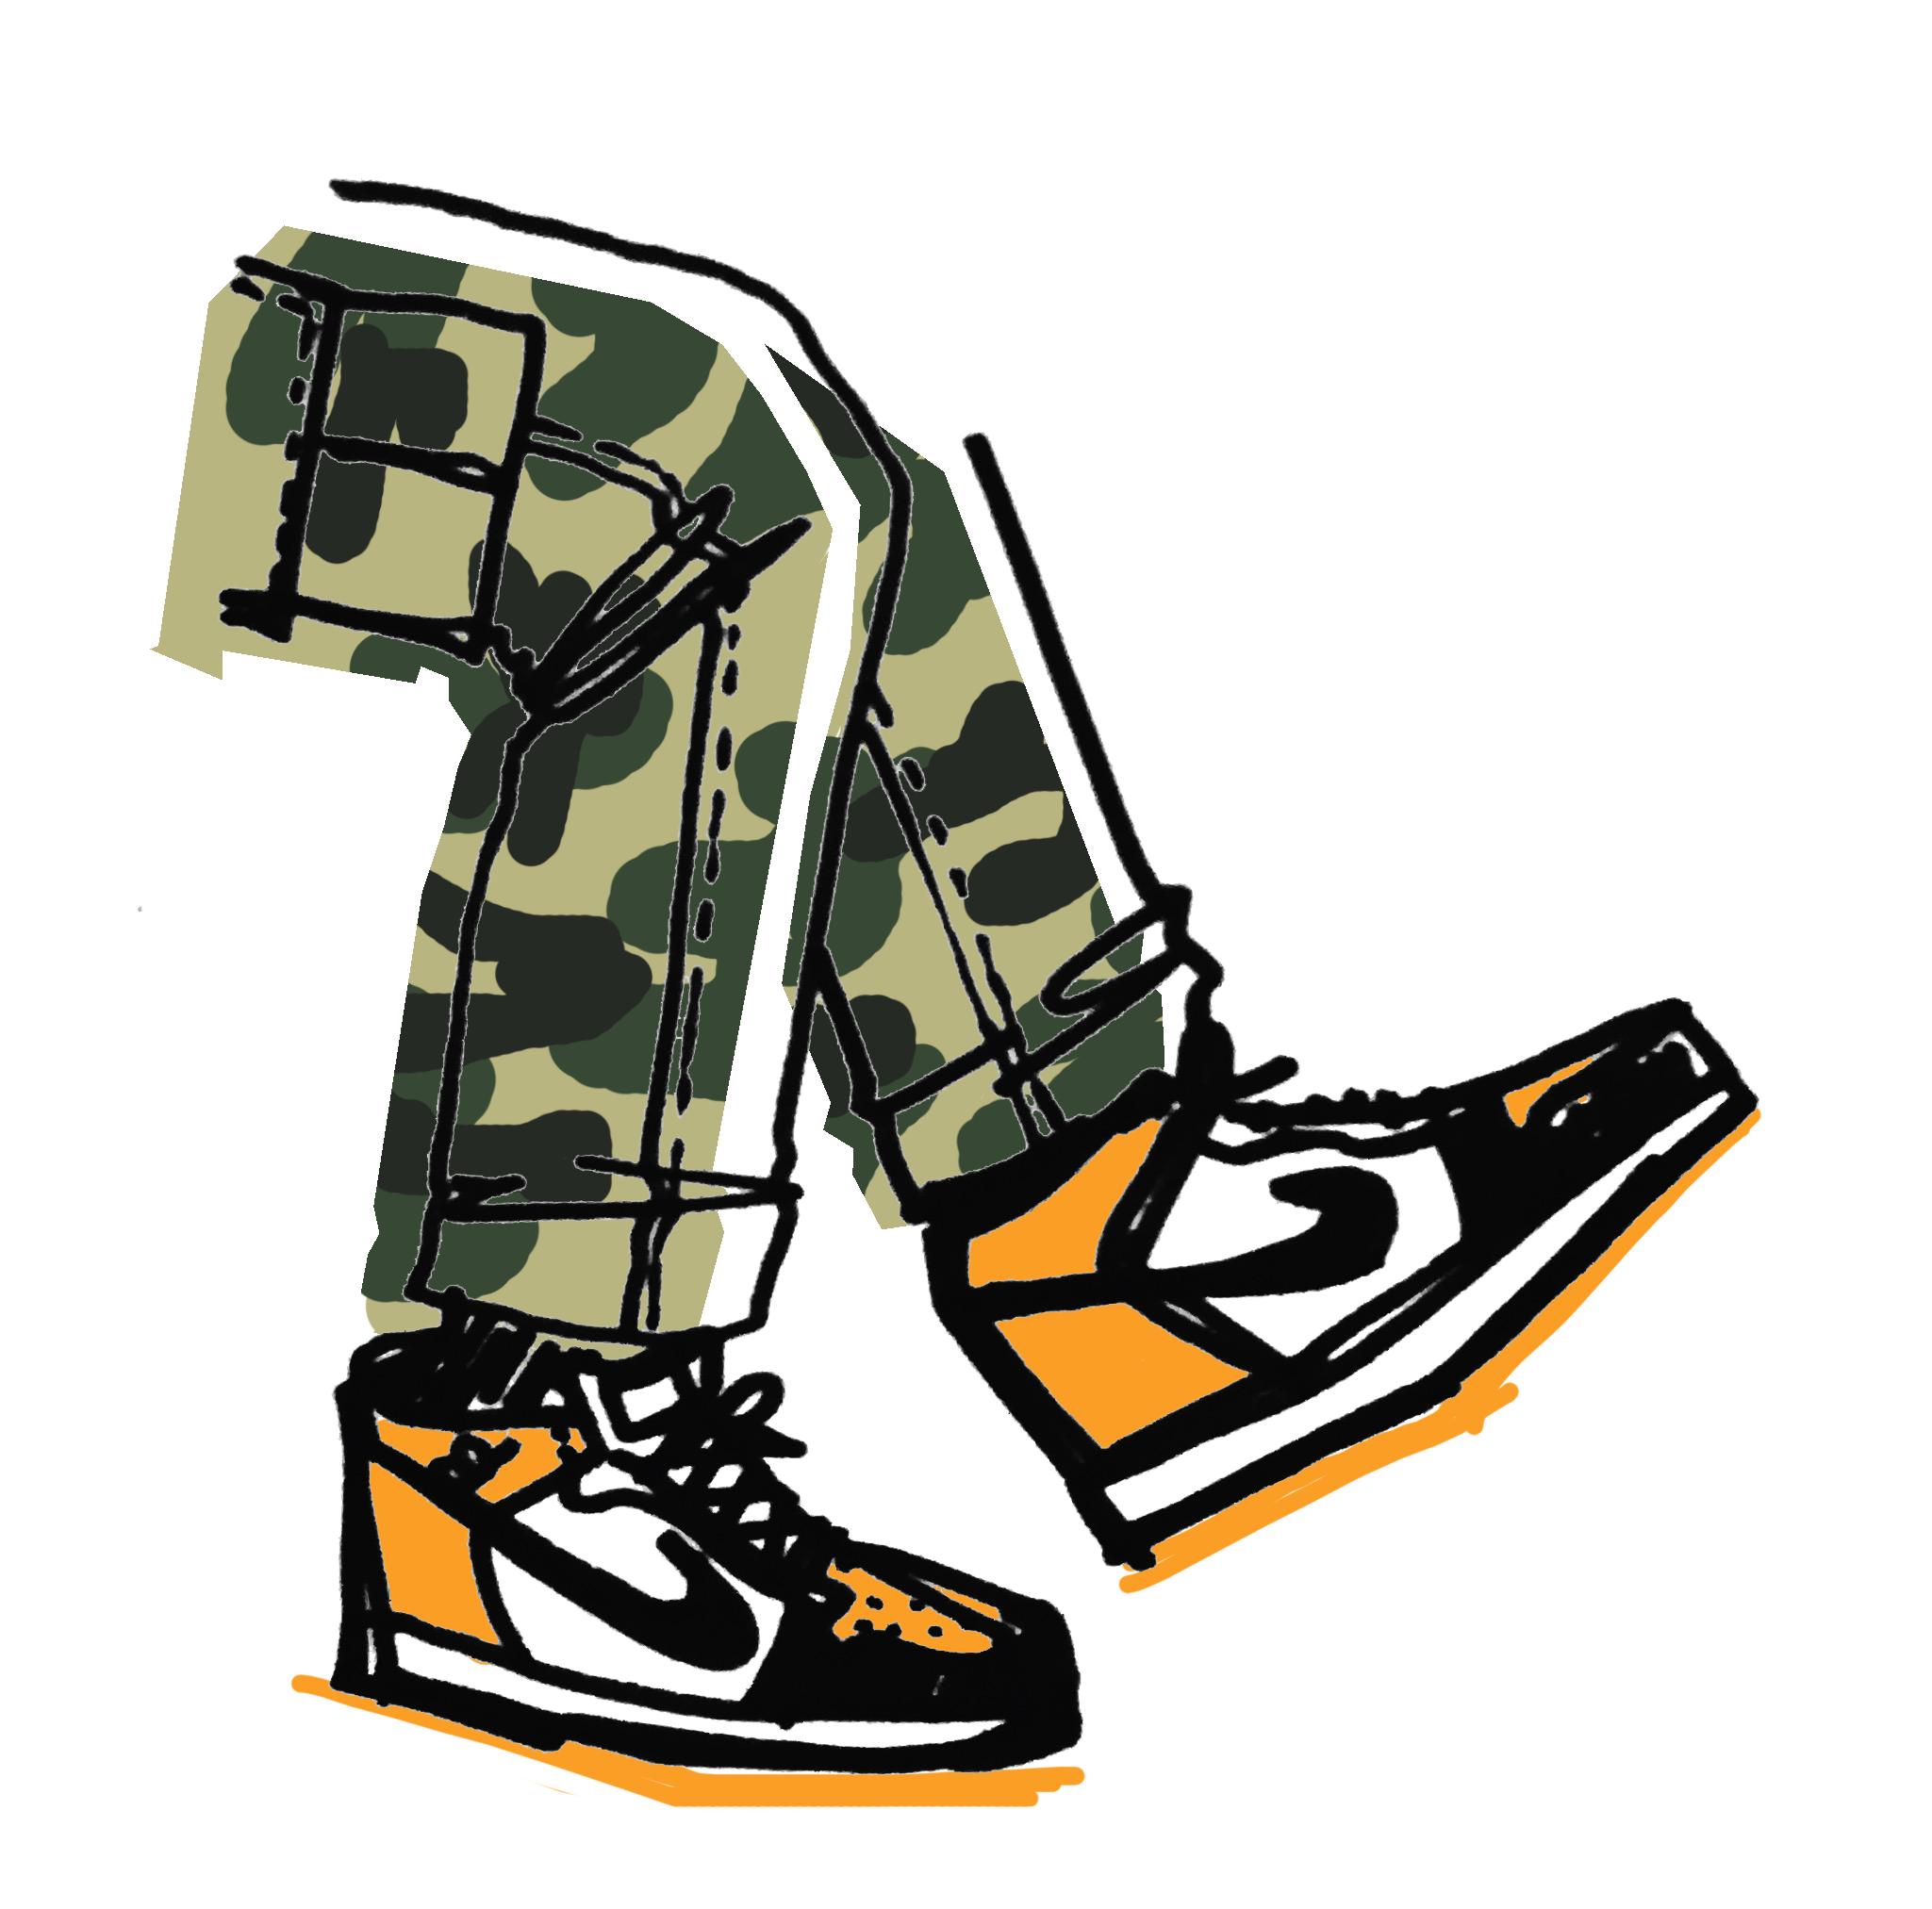 """Camo Pants Orange Nikes"" Print"